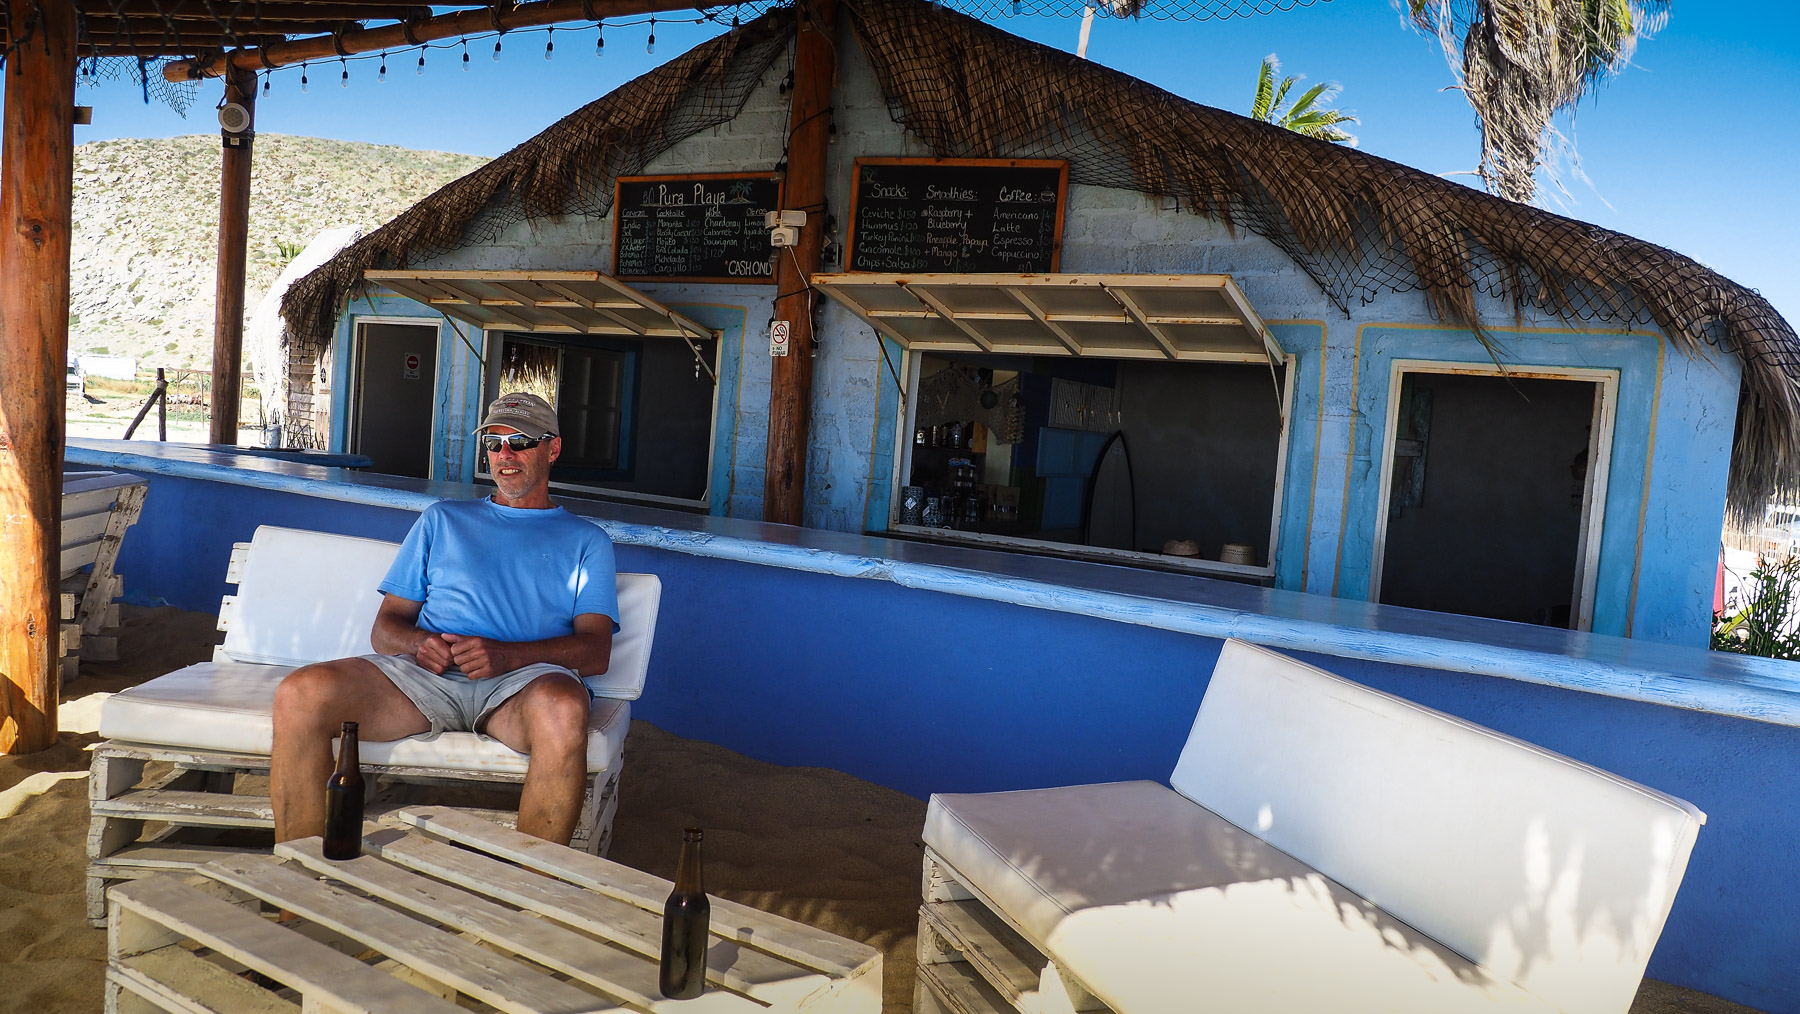 Strandbar mit leckerem rohem Fisch-Ceviche direkt aus dem Meer